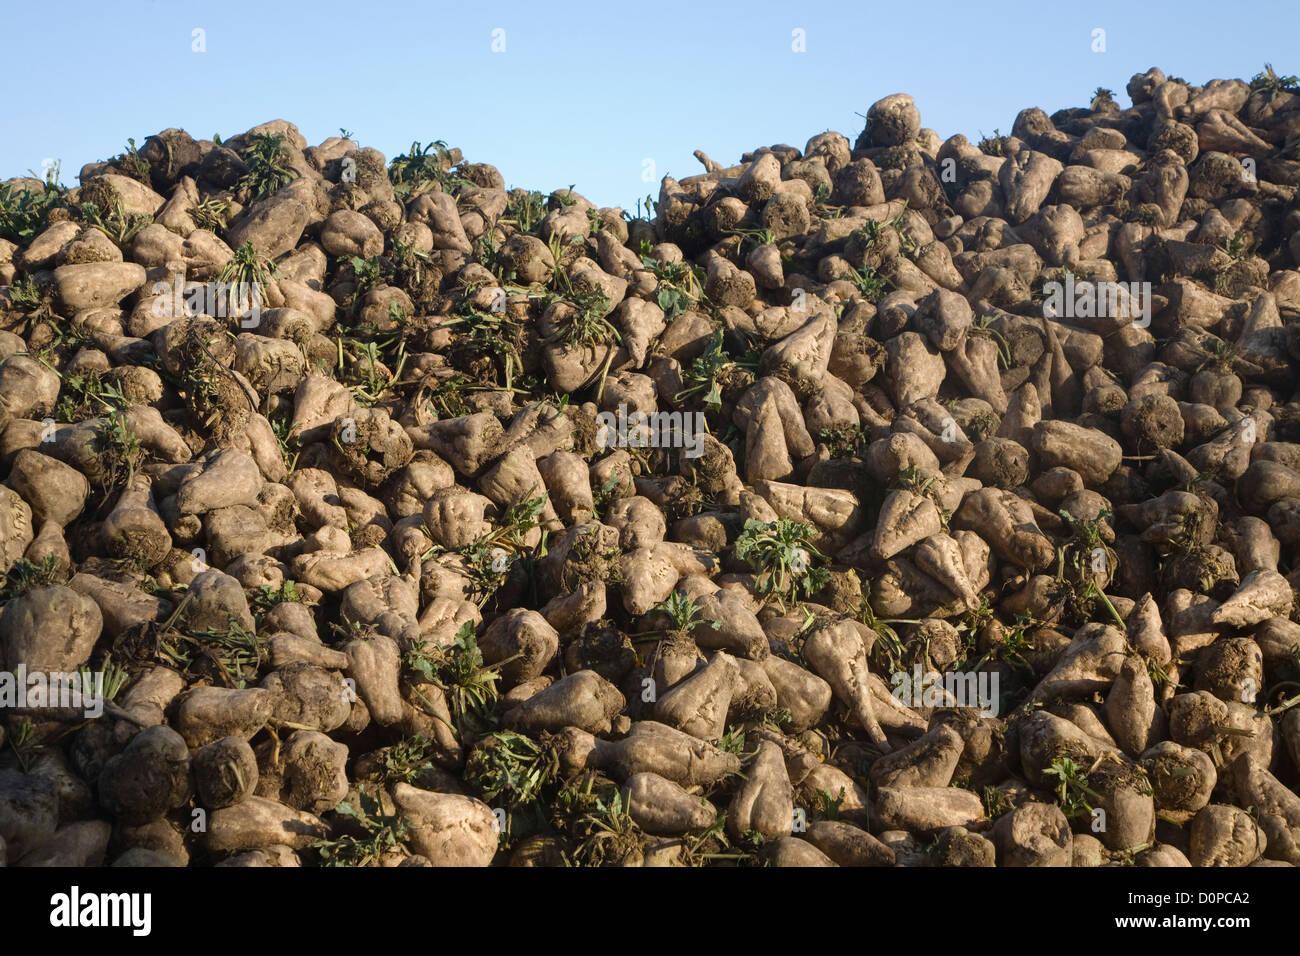 Sugar beet piled up - Stock Image